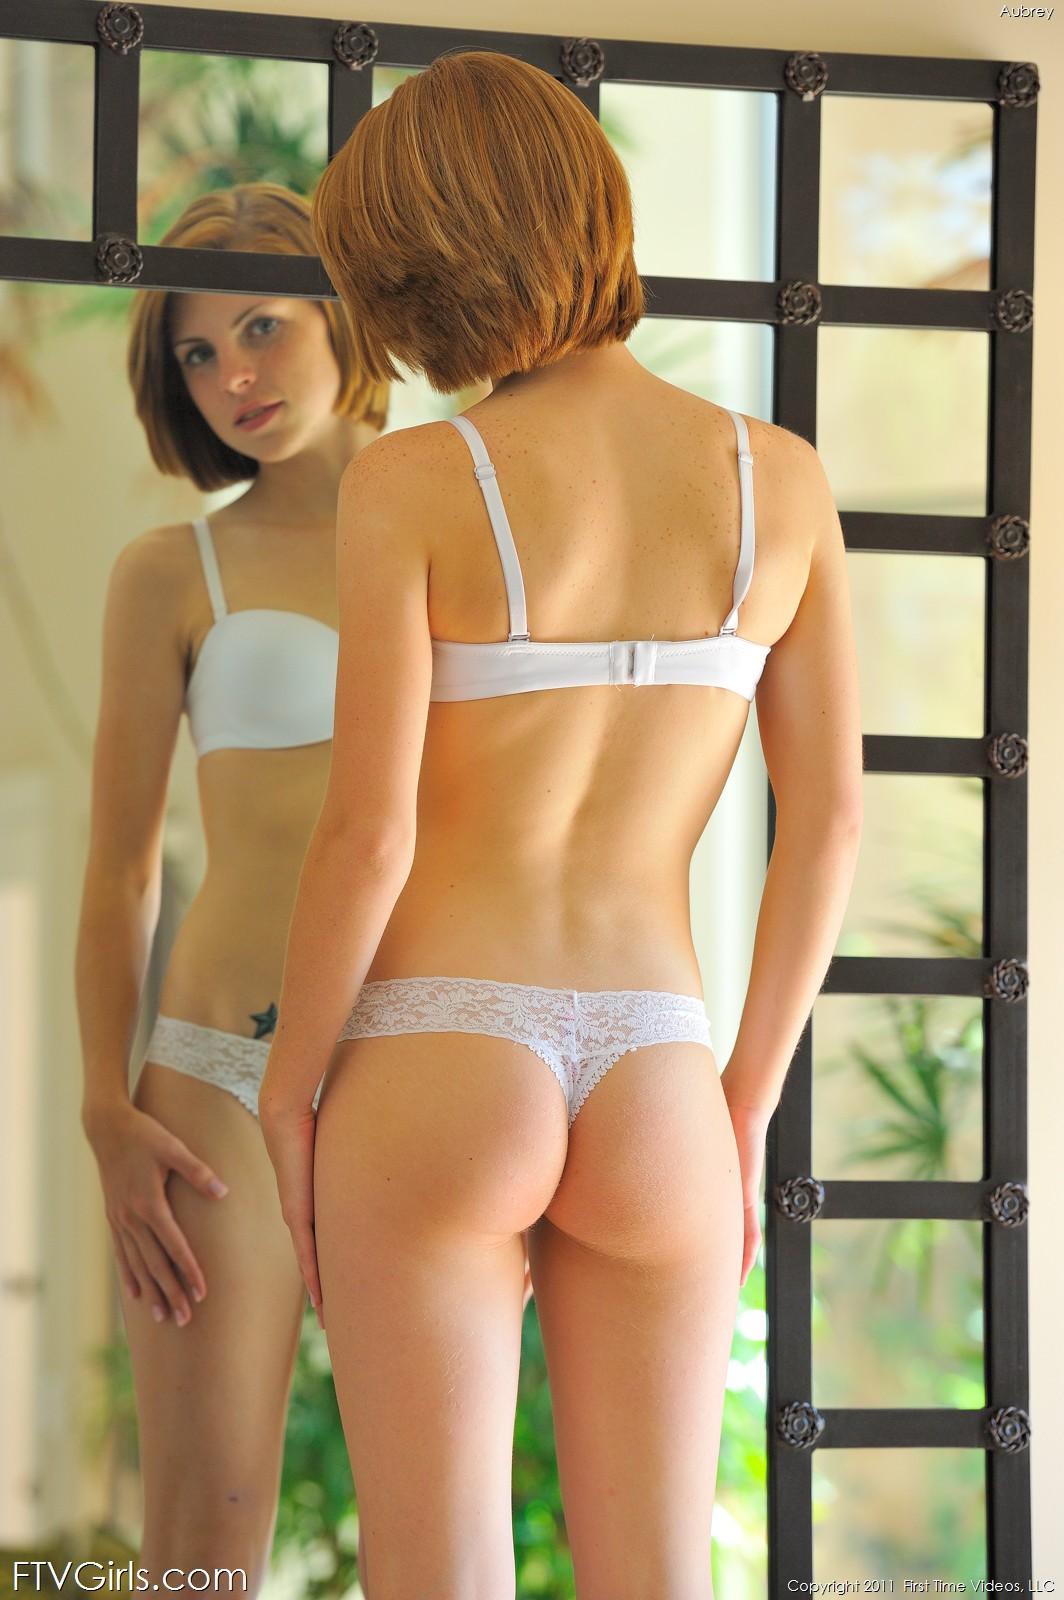 Девушки с короткой стрижкой